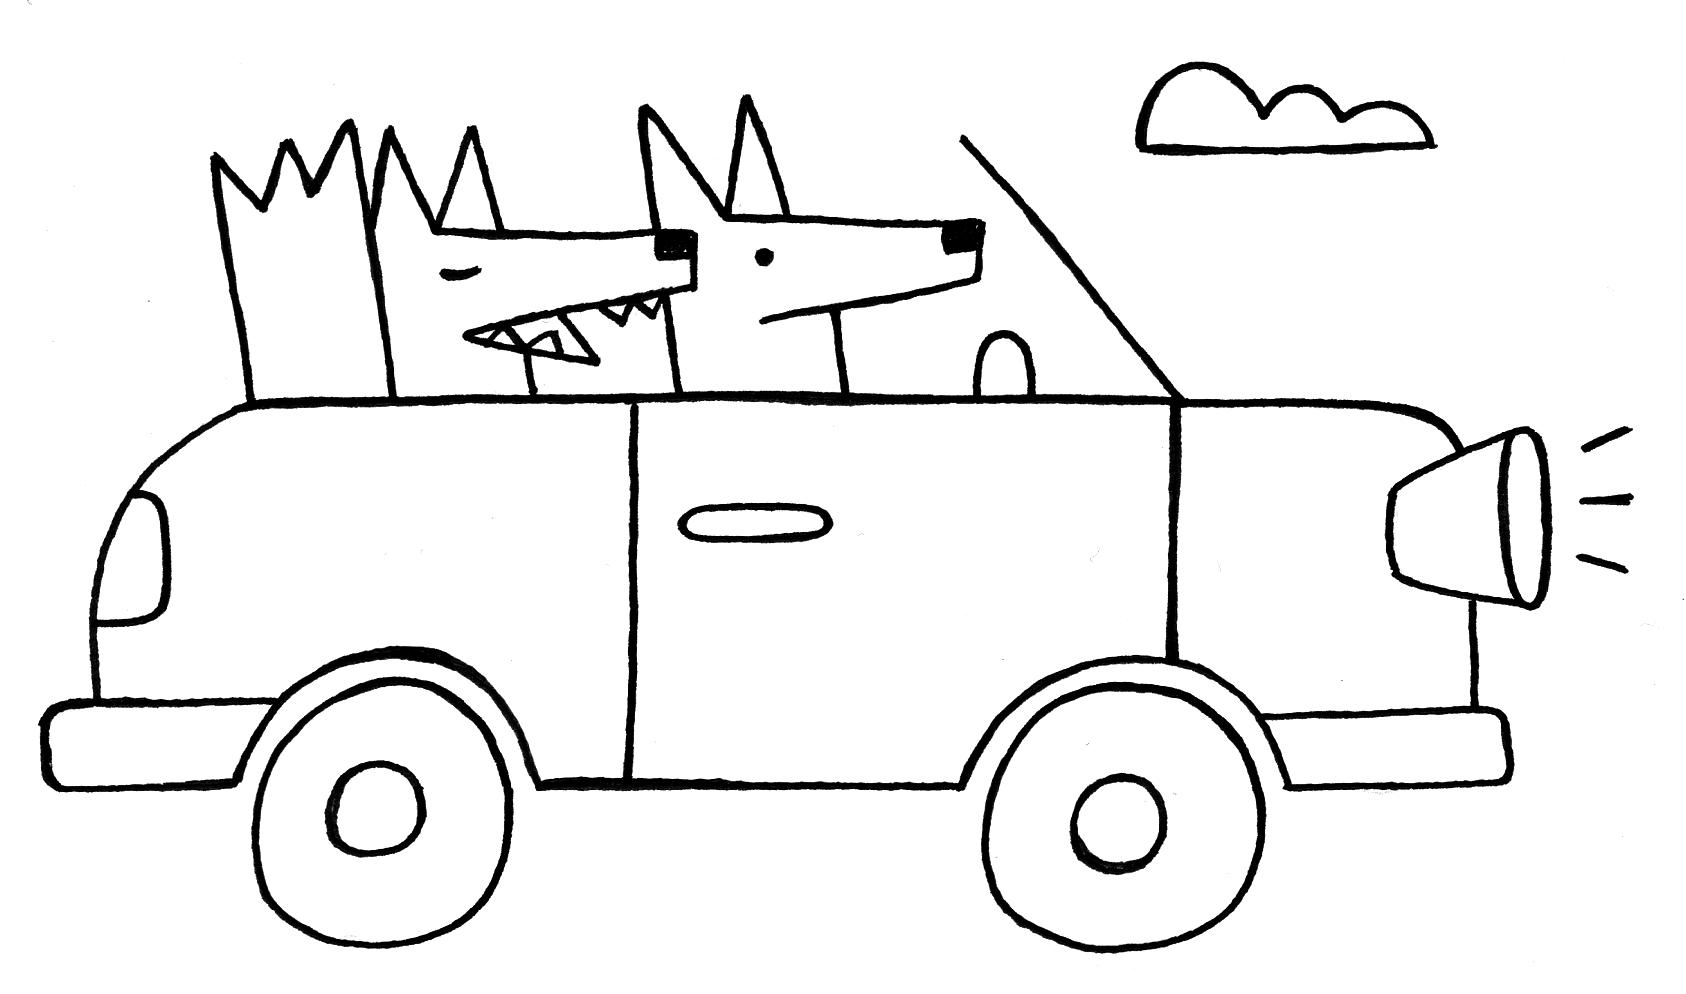 Dingo_Illustration_Print_04Driving.png